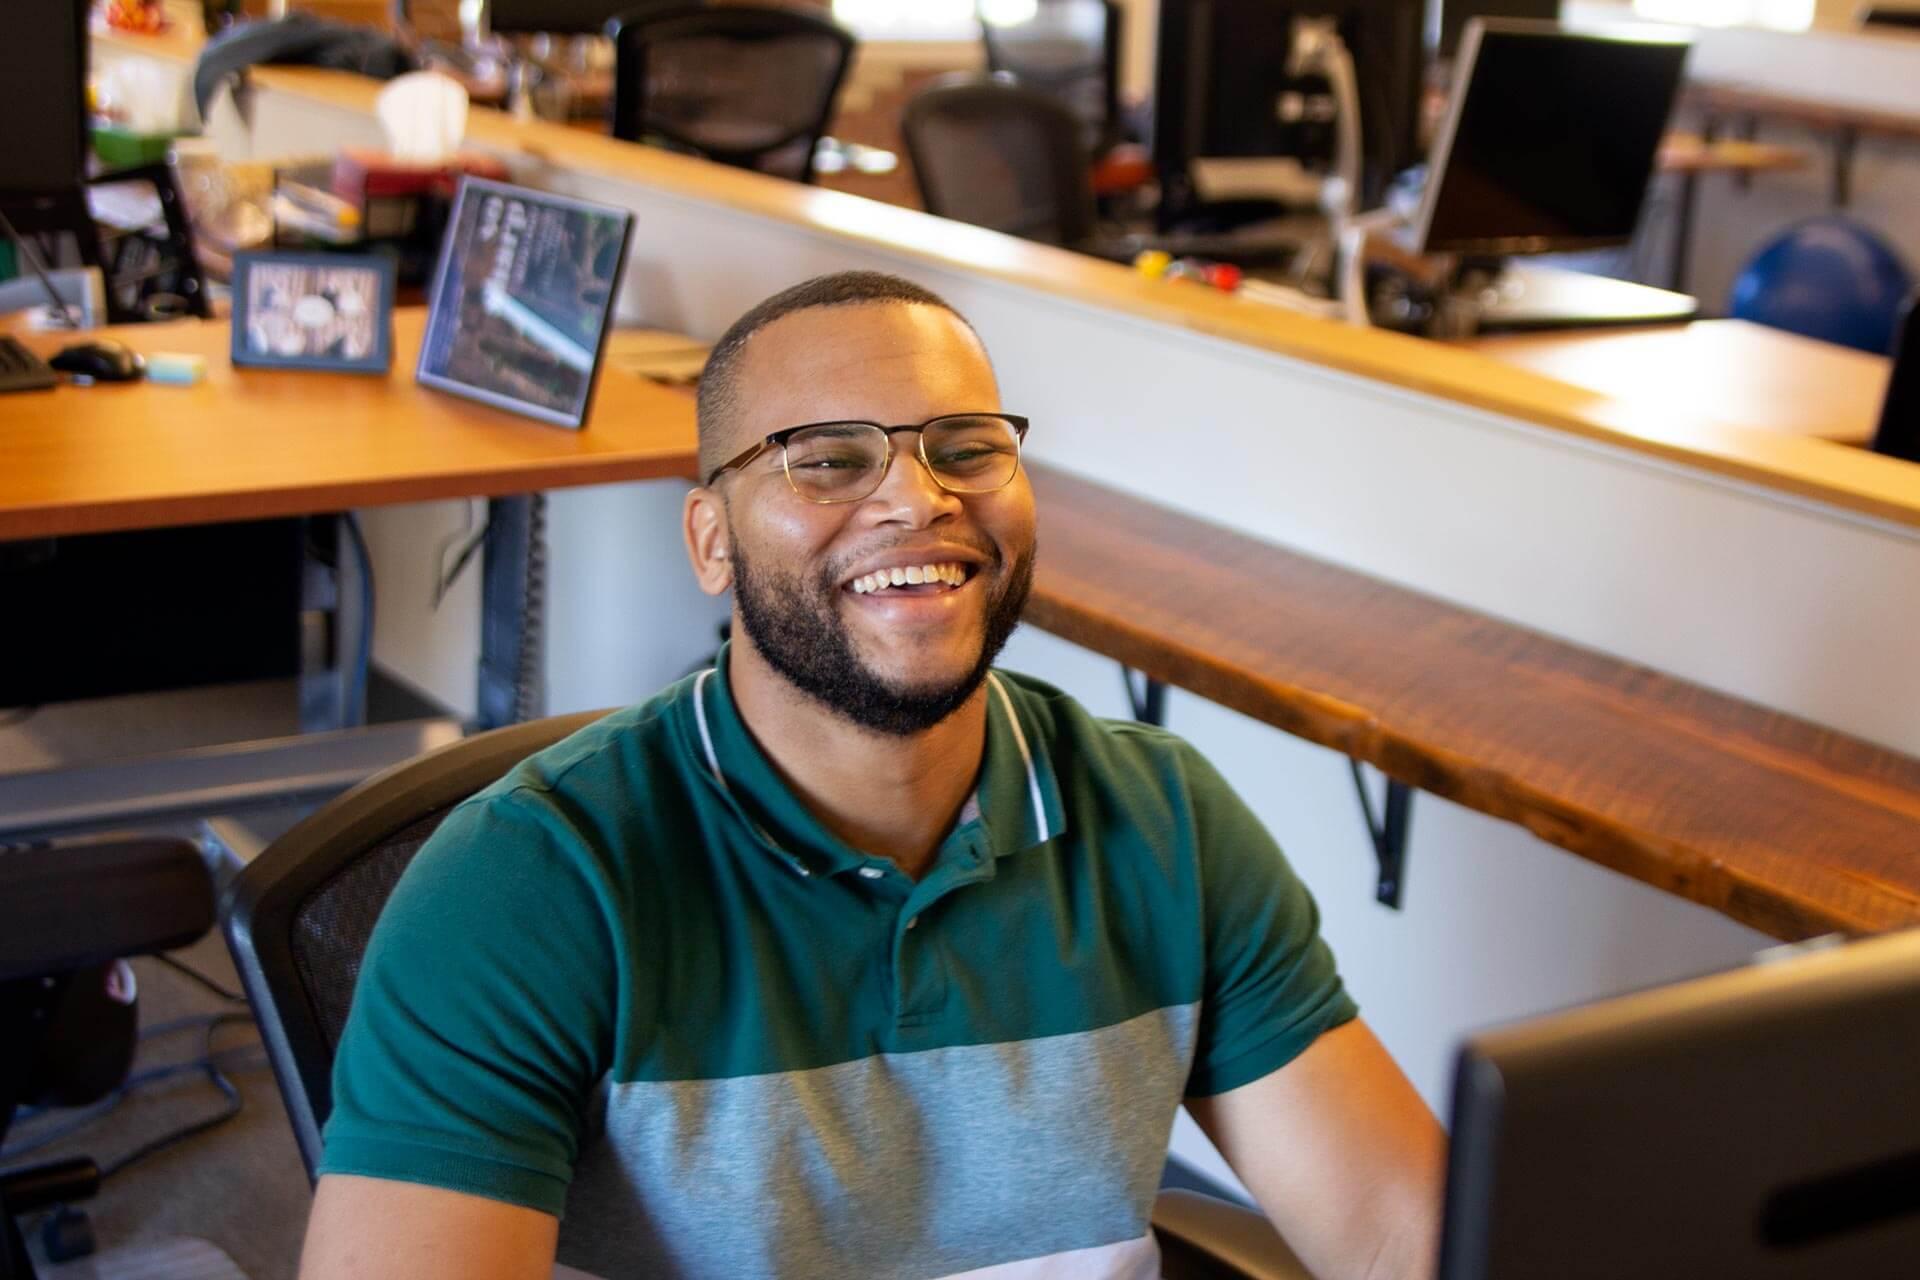 Caktus developer Christopher Dixon at his desk